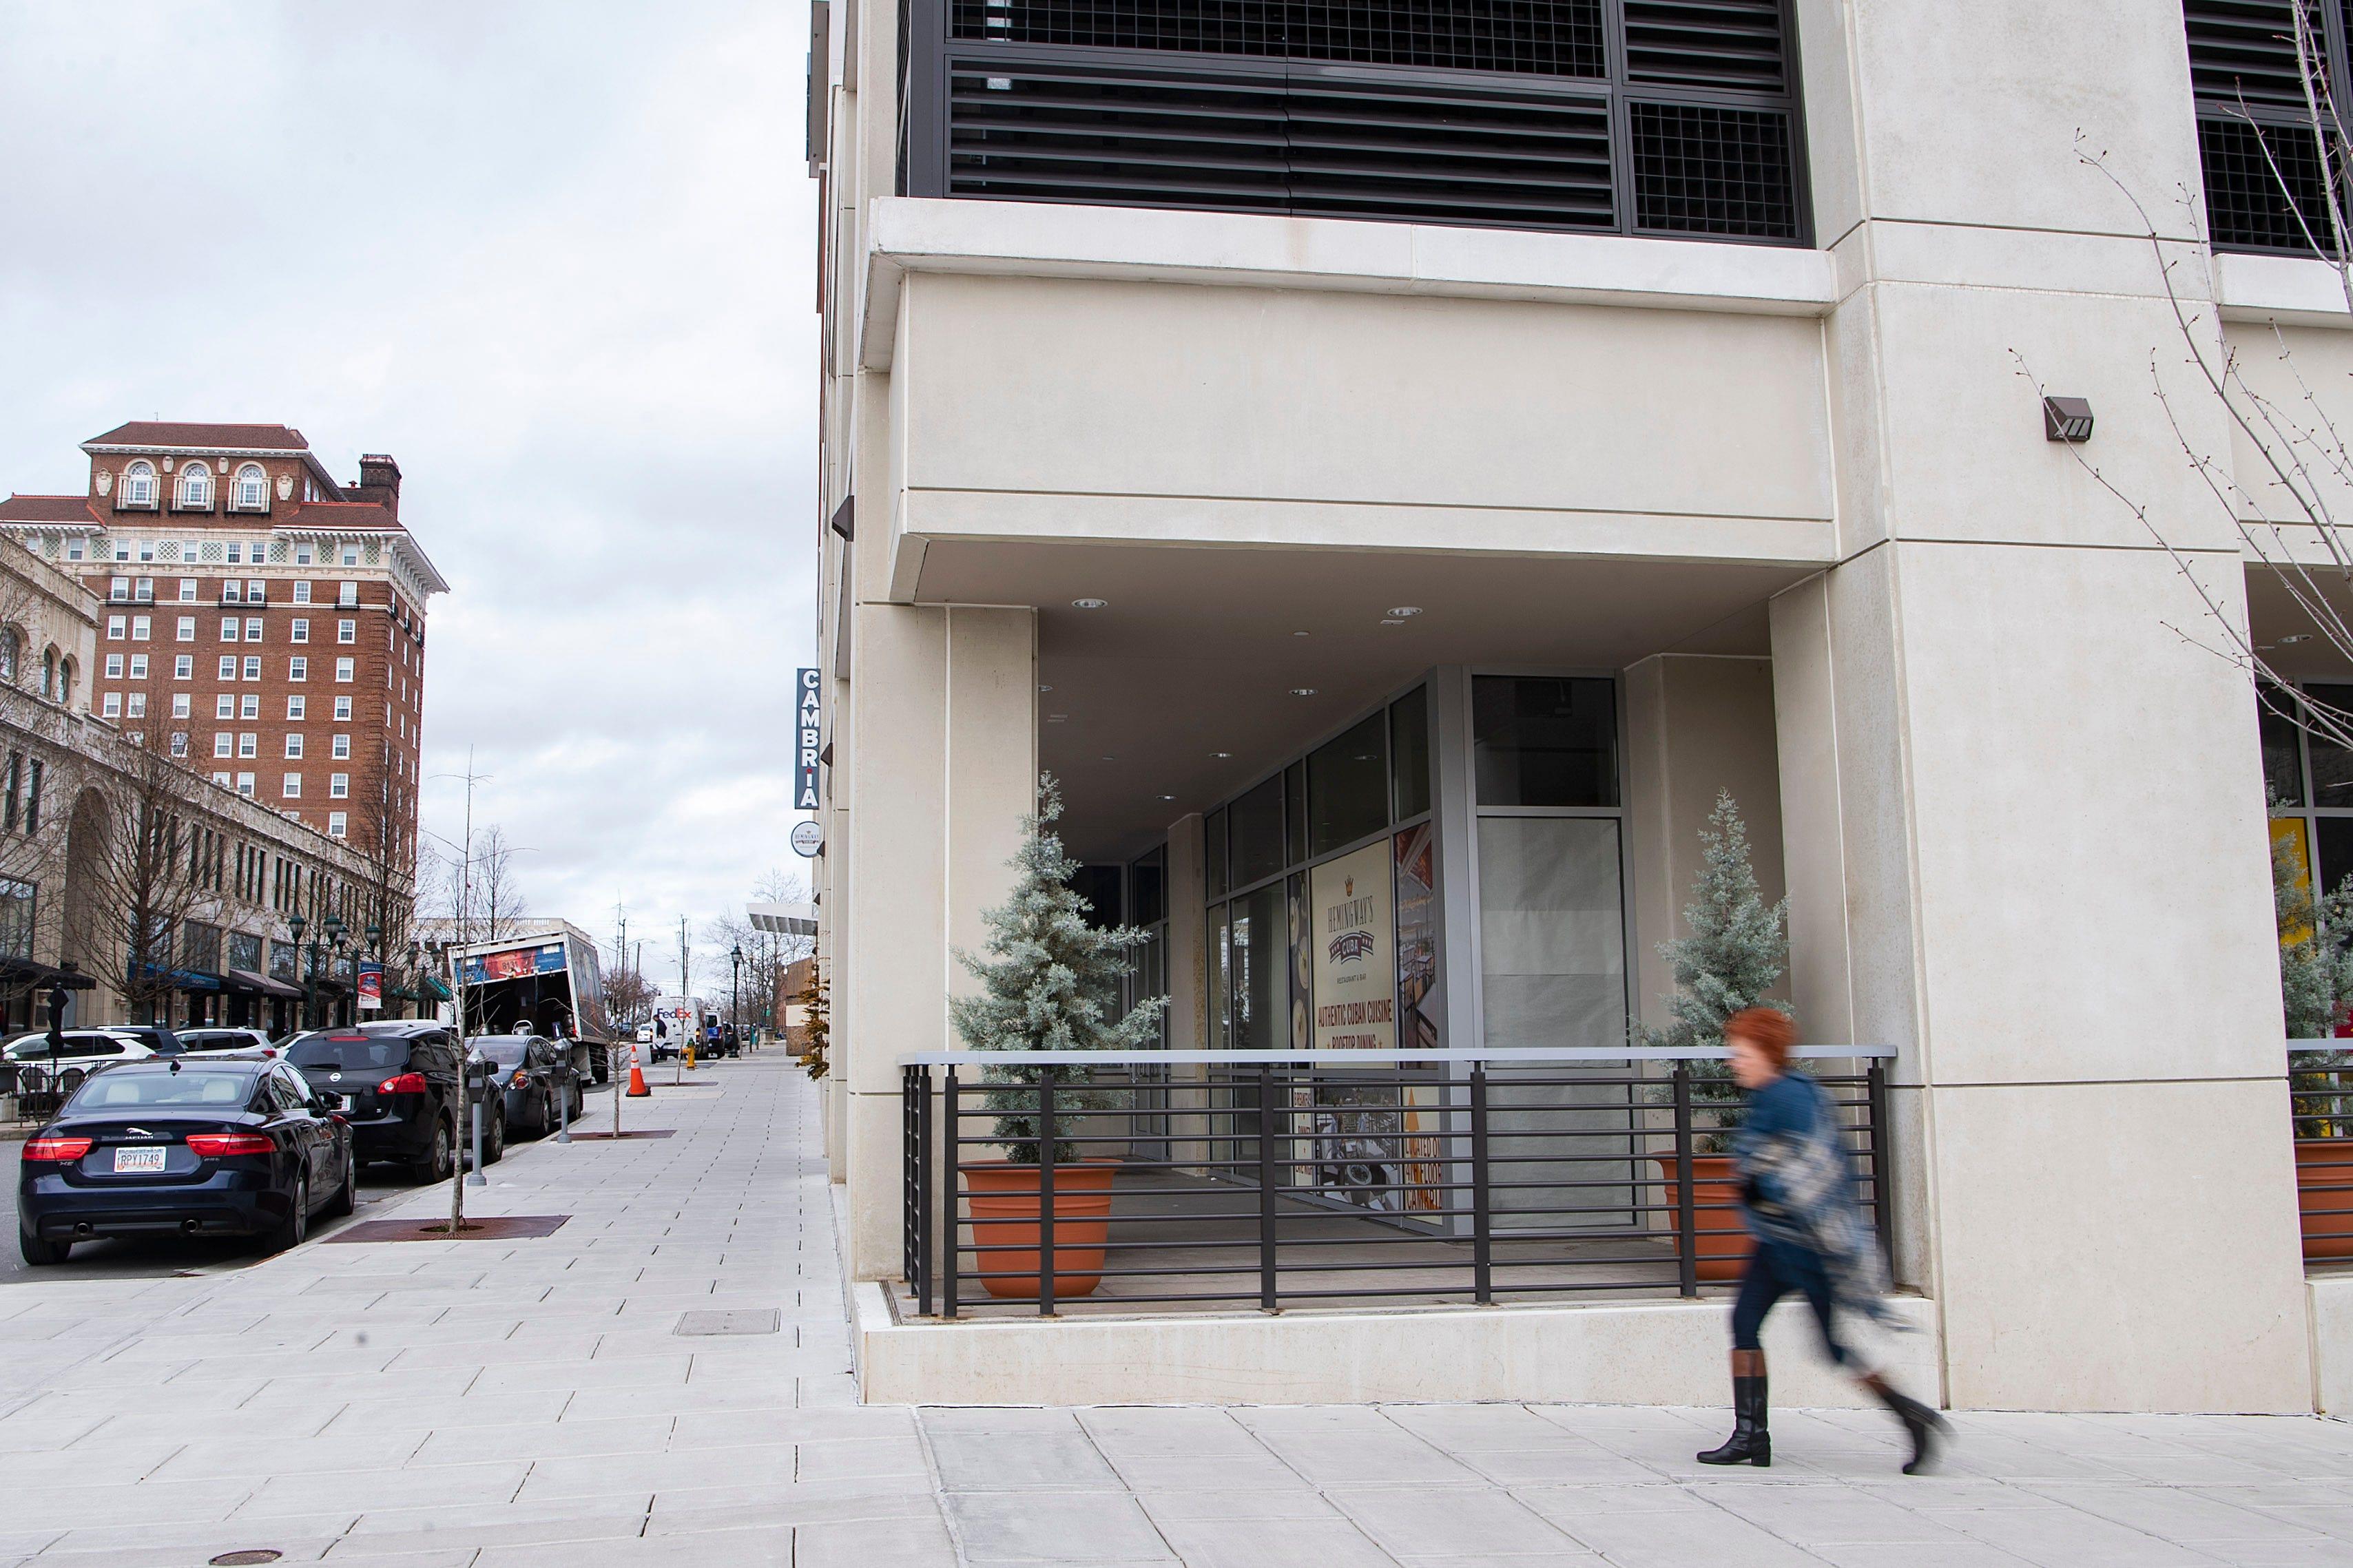 Asheville S Cambria Hotel To Get A Sidewalk Level Spanish Restaurant